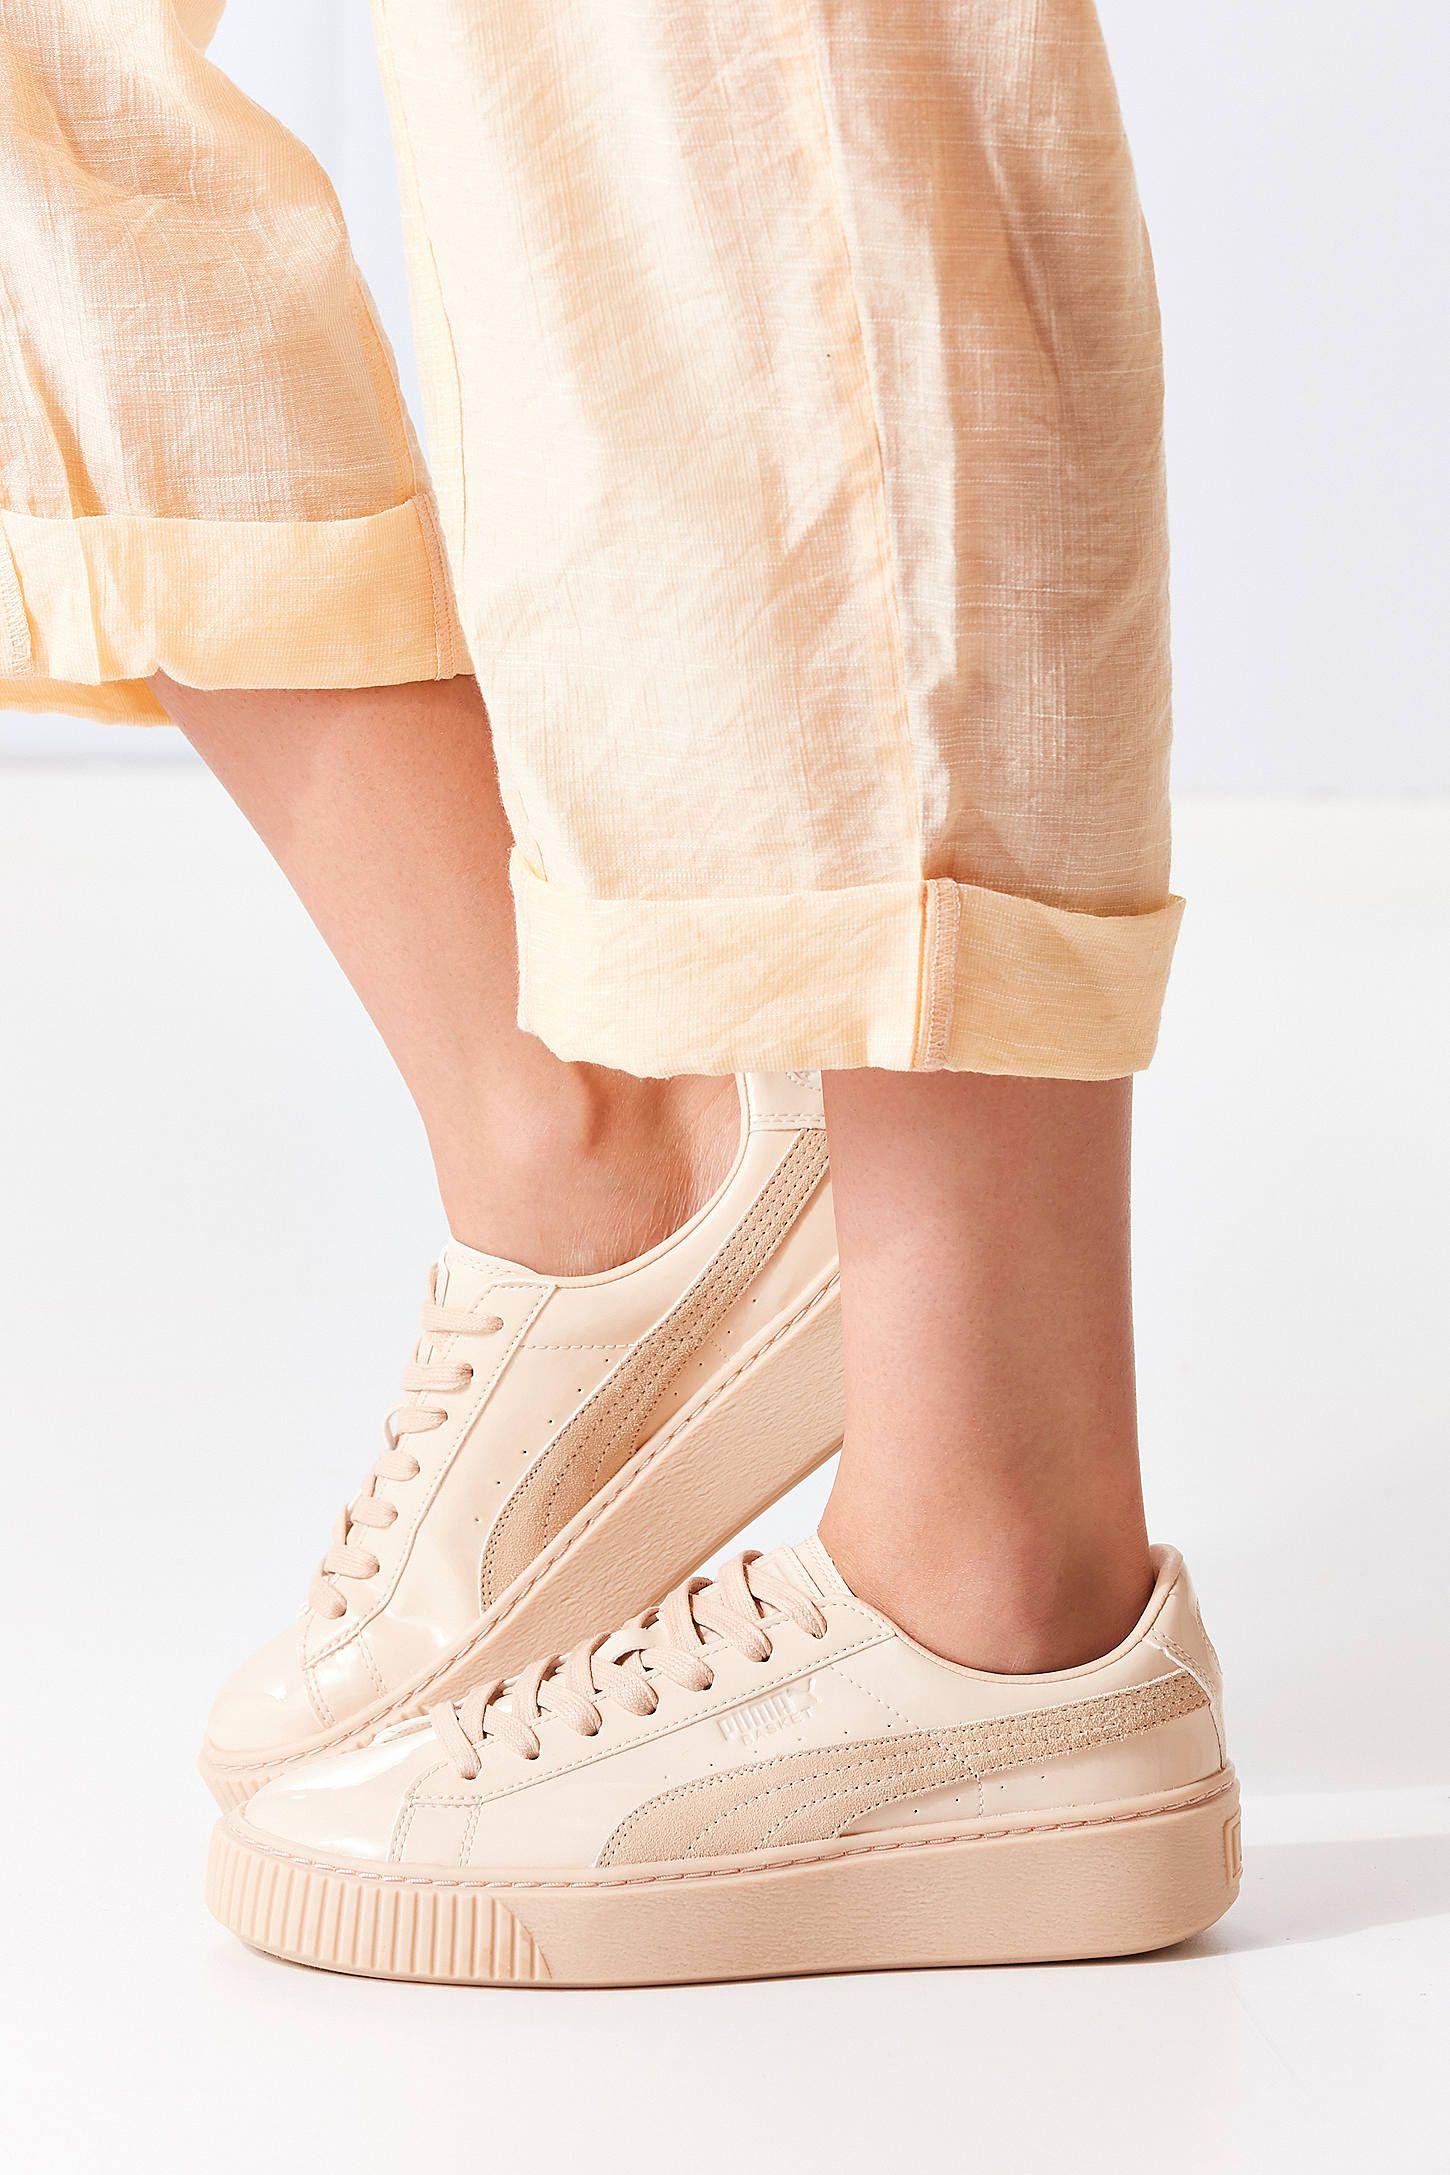 puma basket patent leather platform sneaker beige